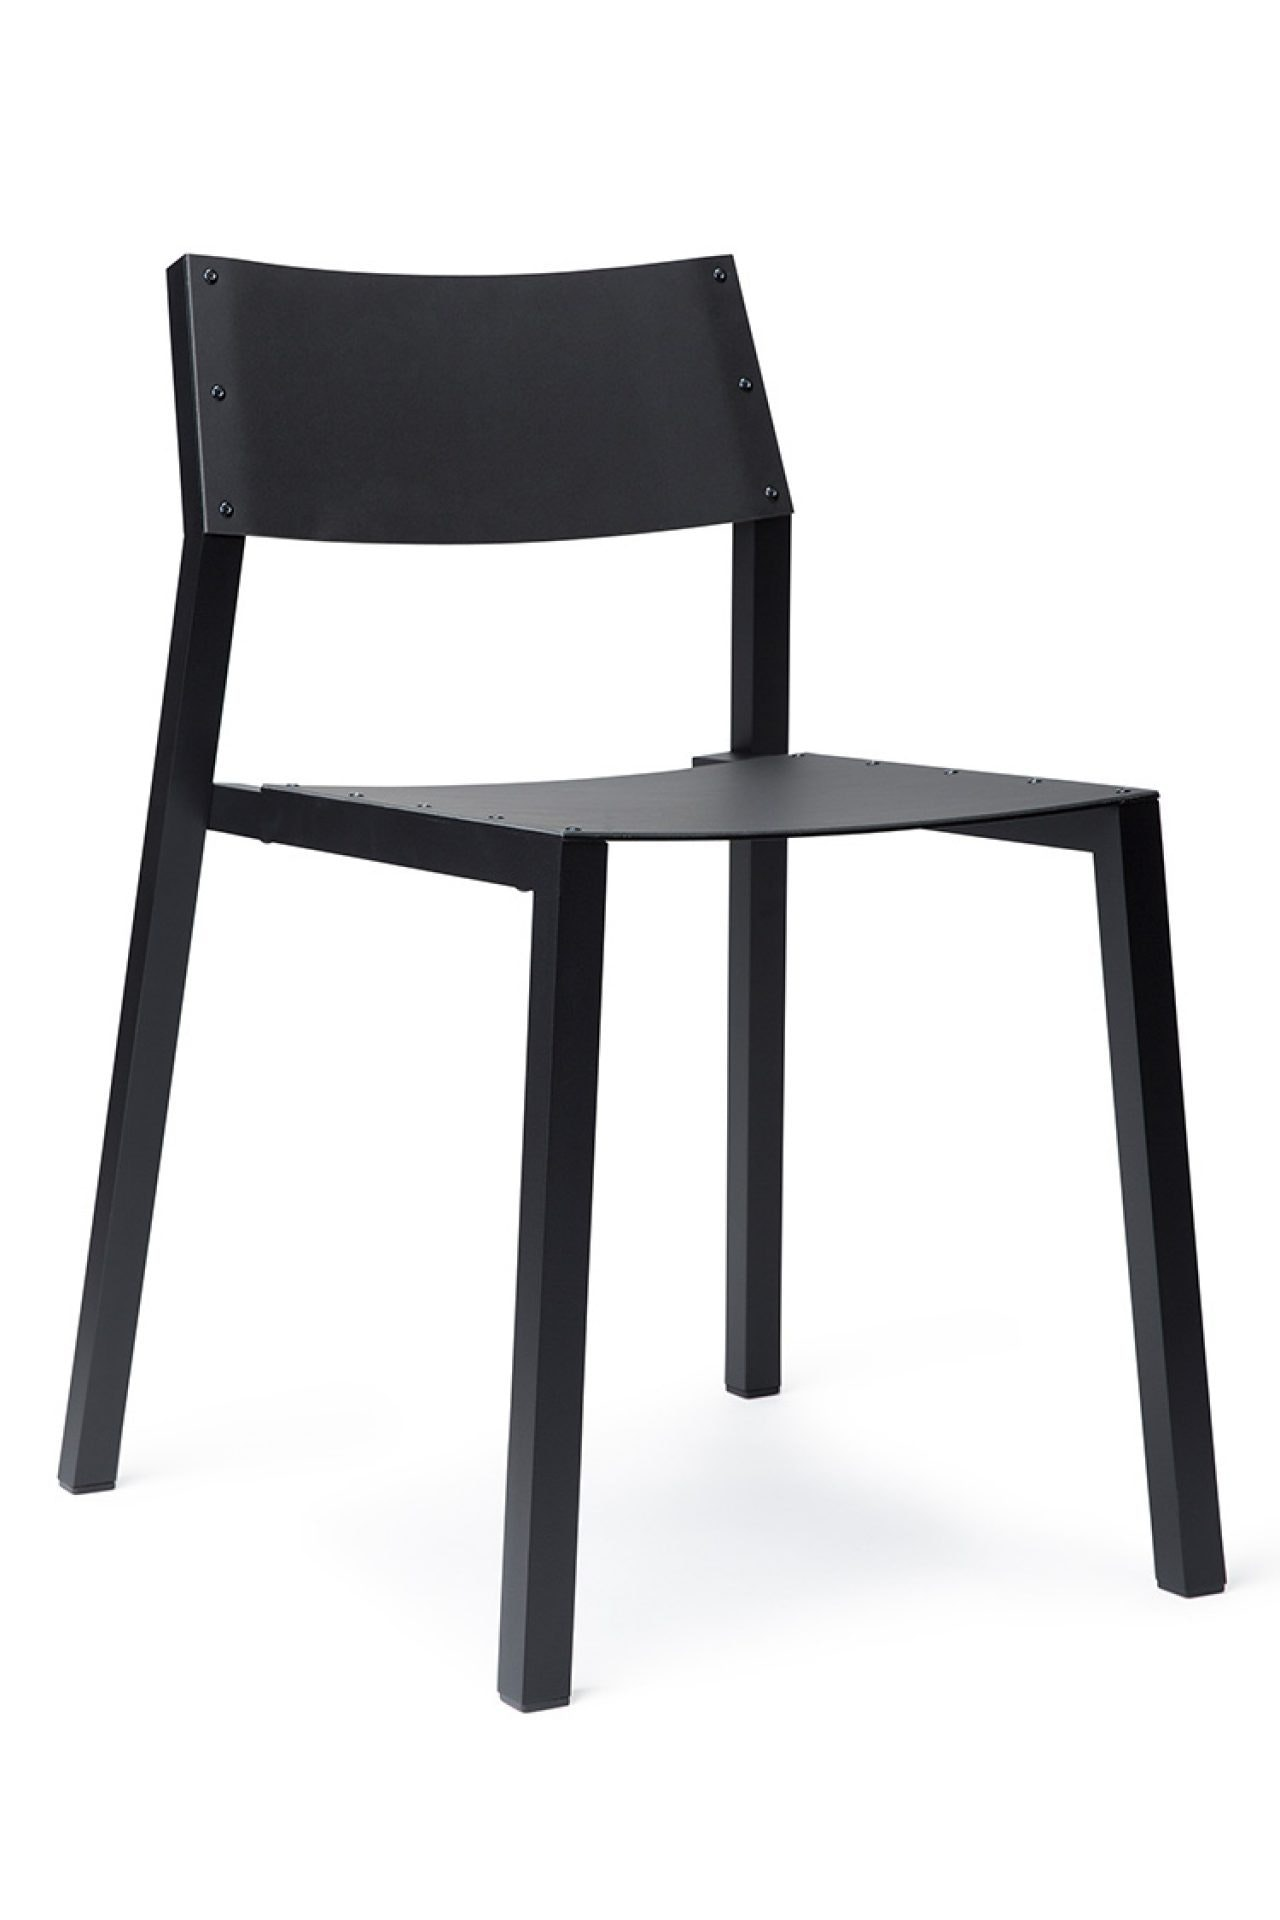 Tube Chair Black Black Side Angle